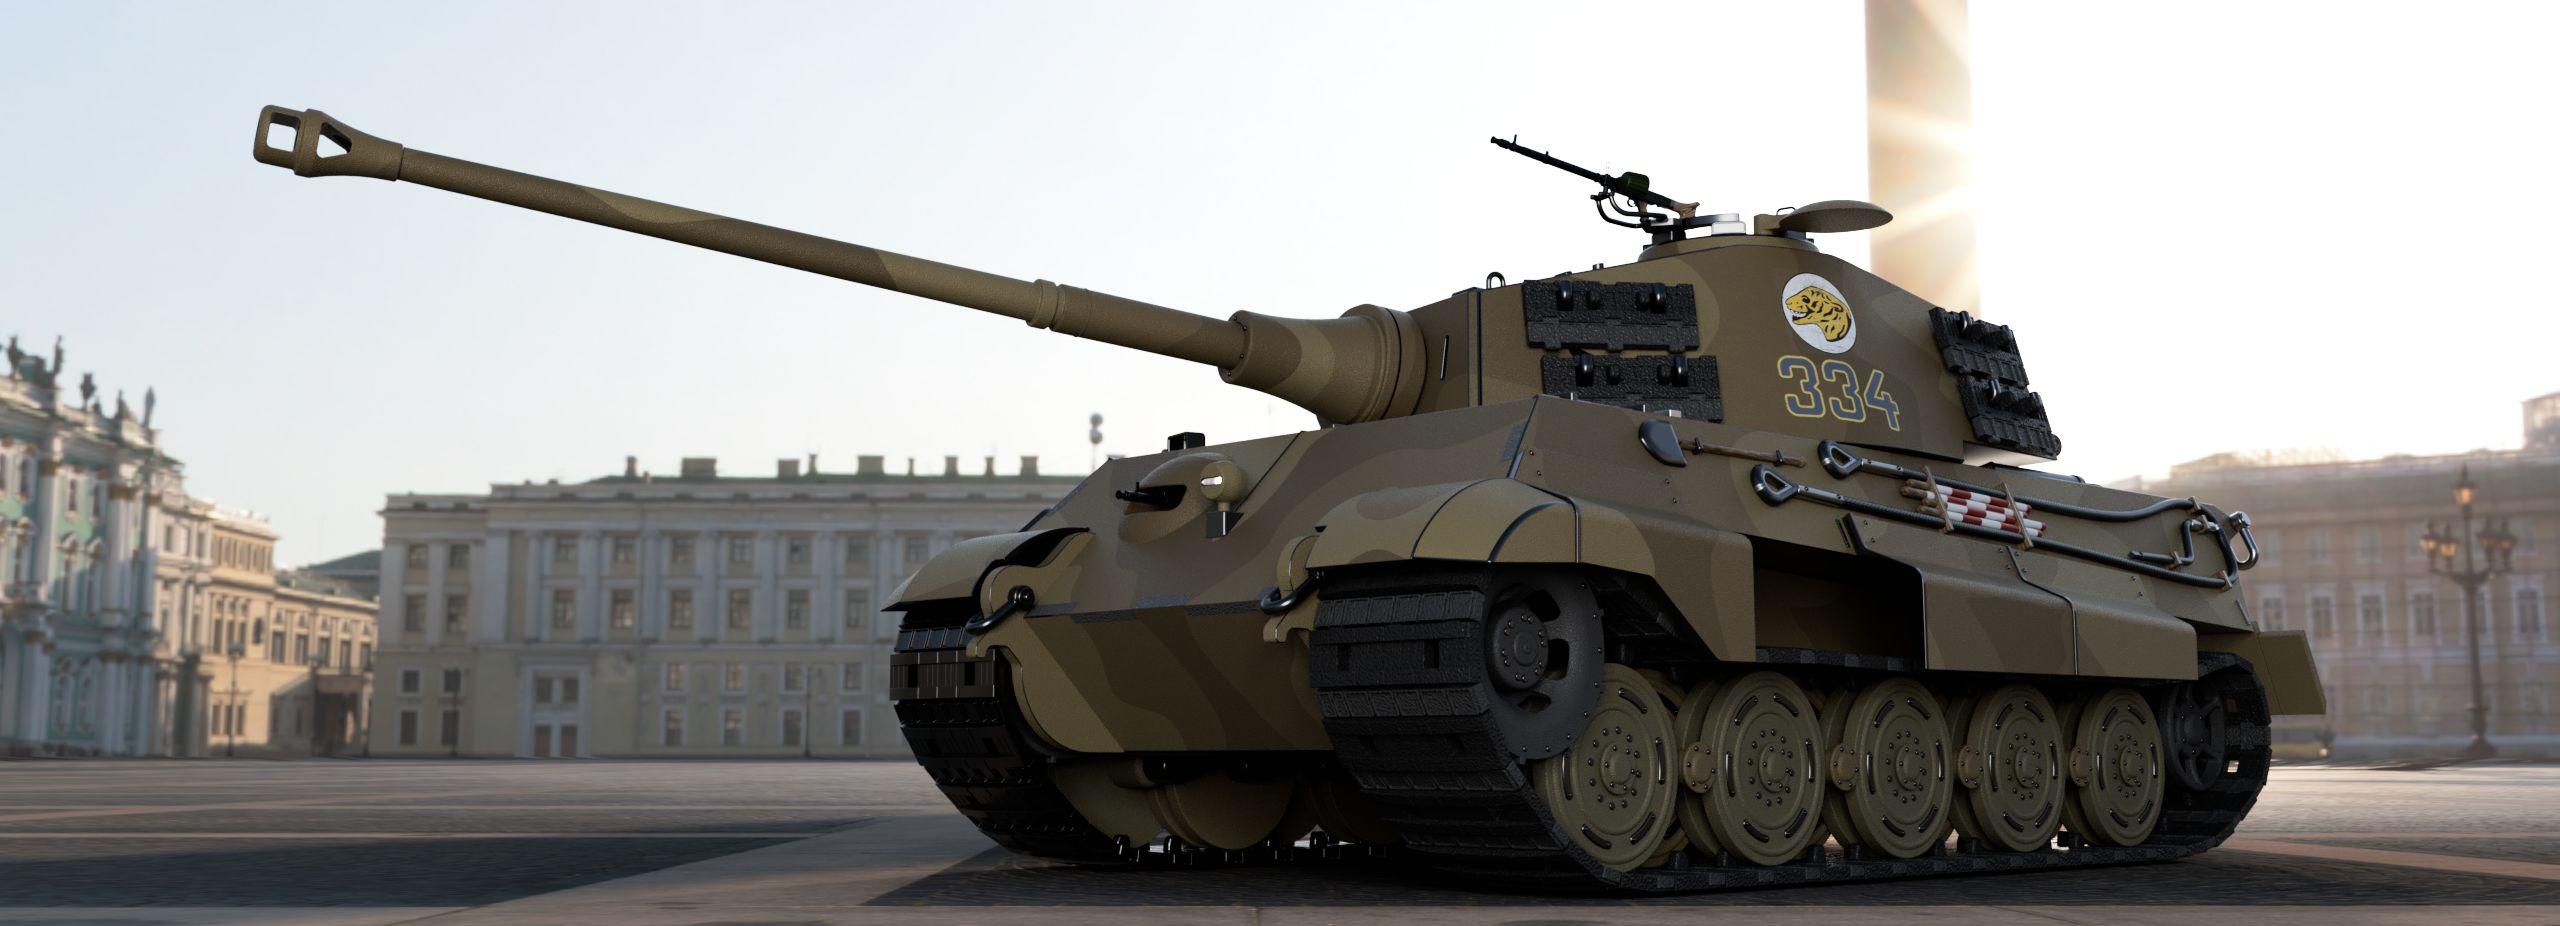 Tiger-ii-komplett-wuste-2018-sep-20-08-13-02am-000-customizedview1093968081-png-3500-3500